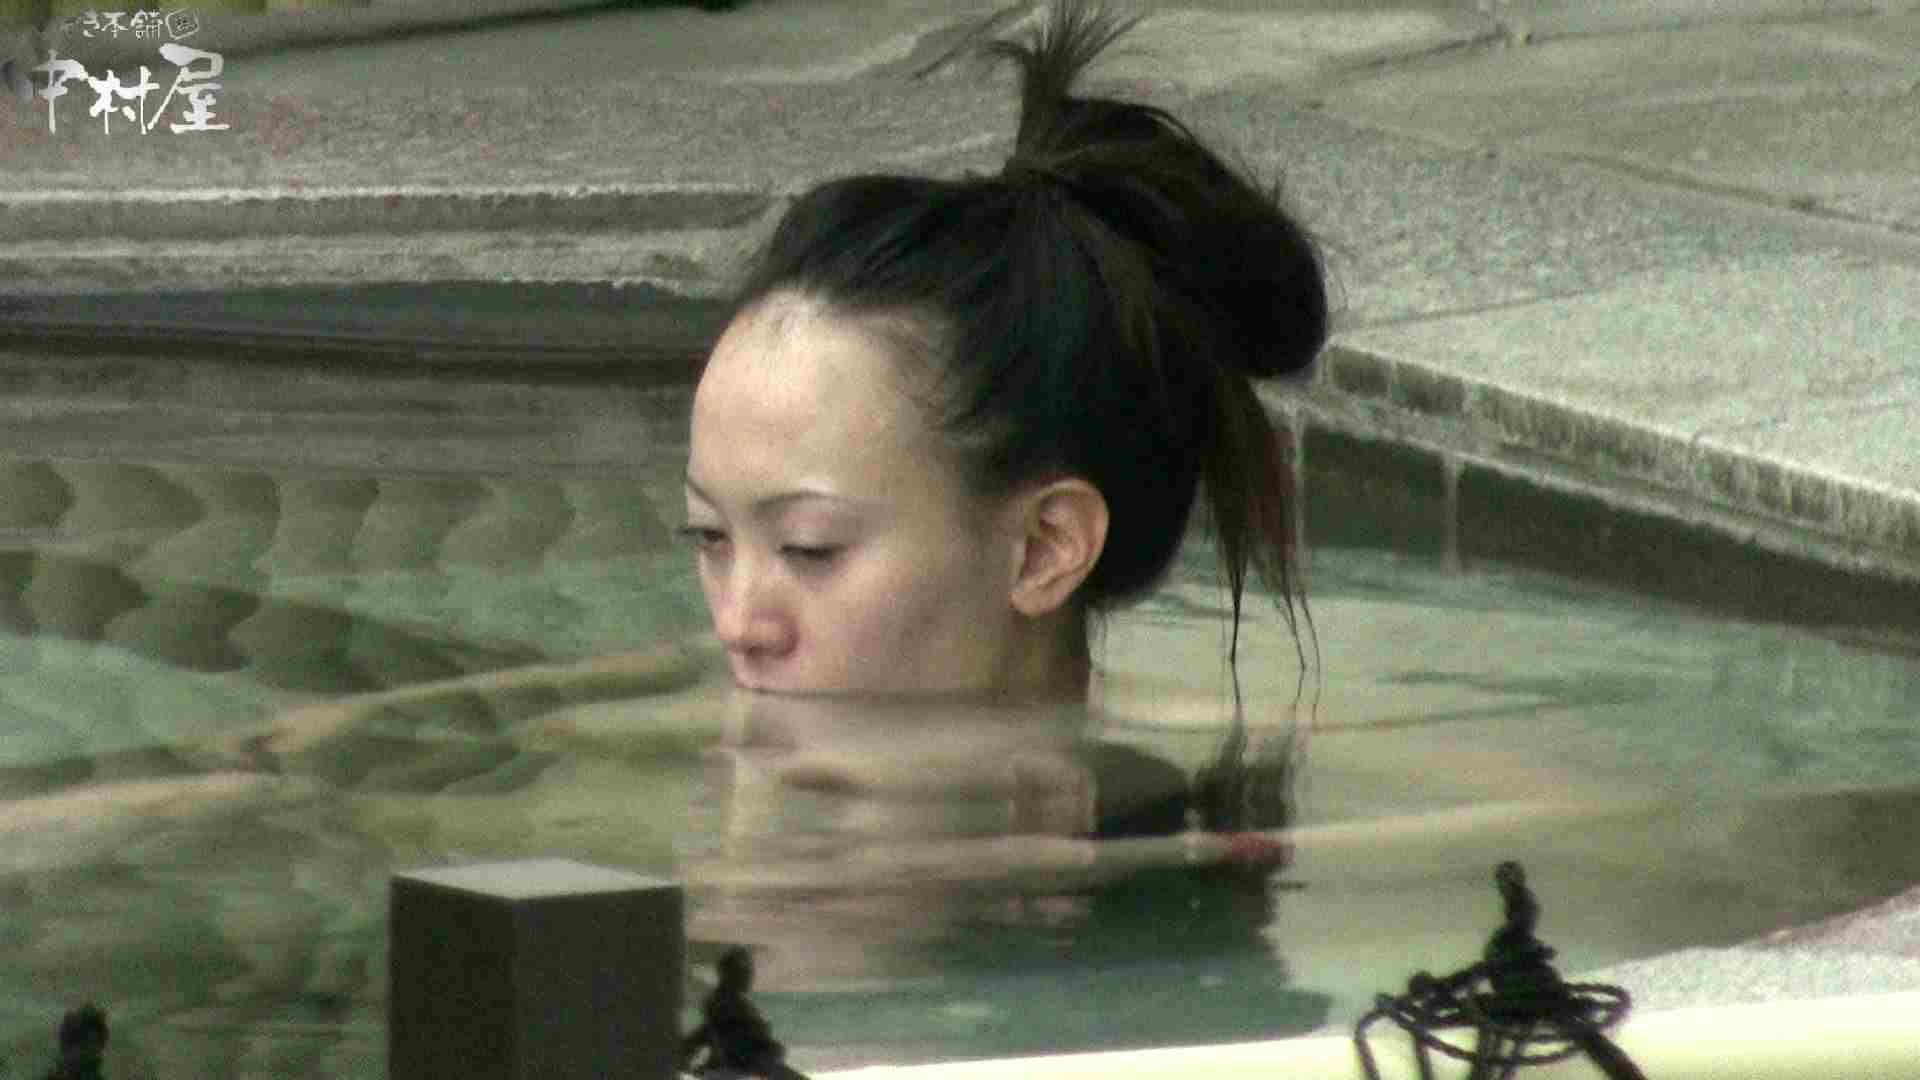 Aquaな露天風呂Vol.900 OLのエロ生活 すけべAV動画紹介 88連発 32